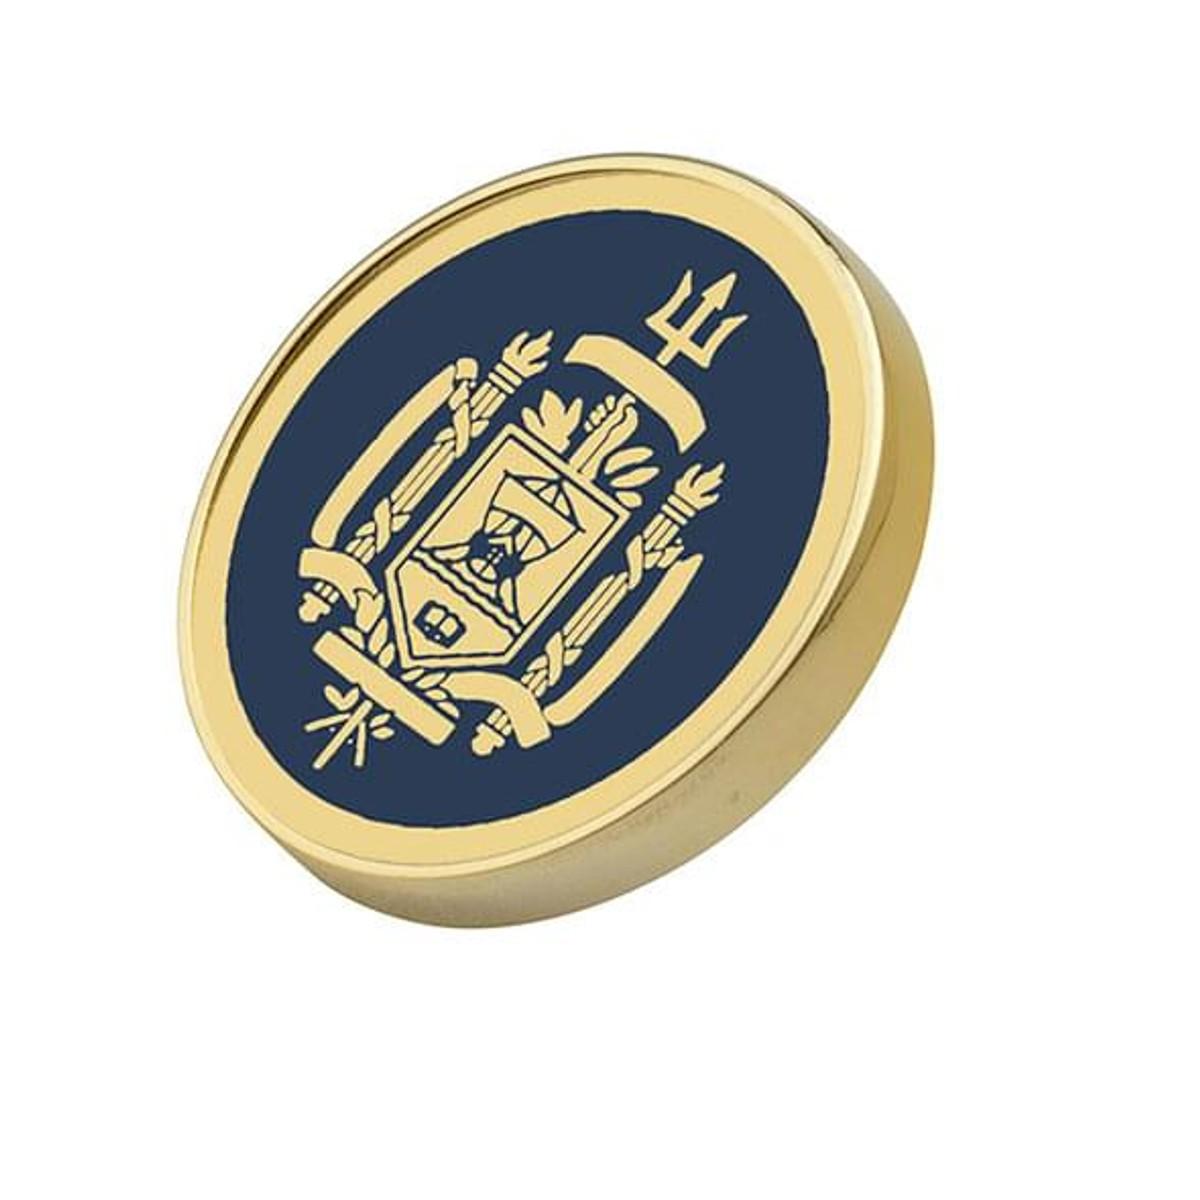 Naval Academy Lapel Pin At M Lahart Amp Co